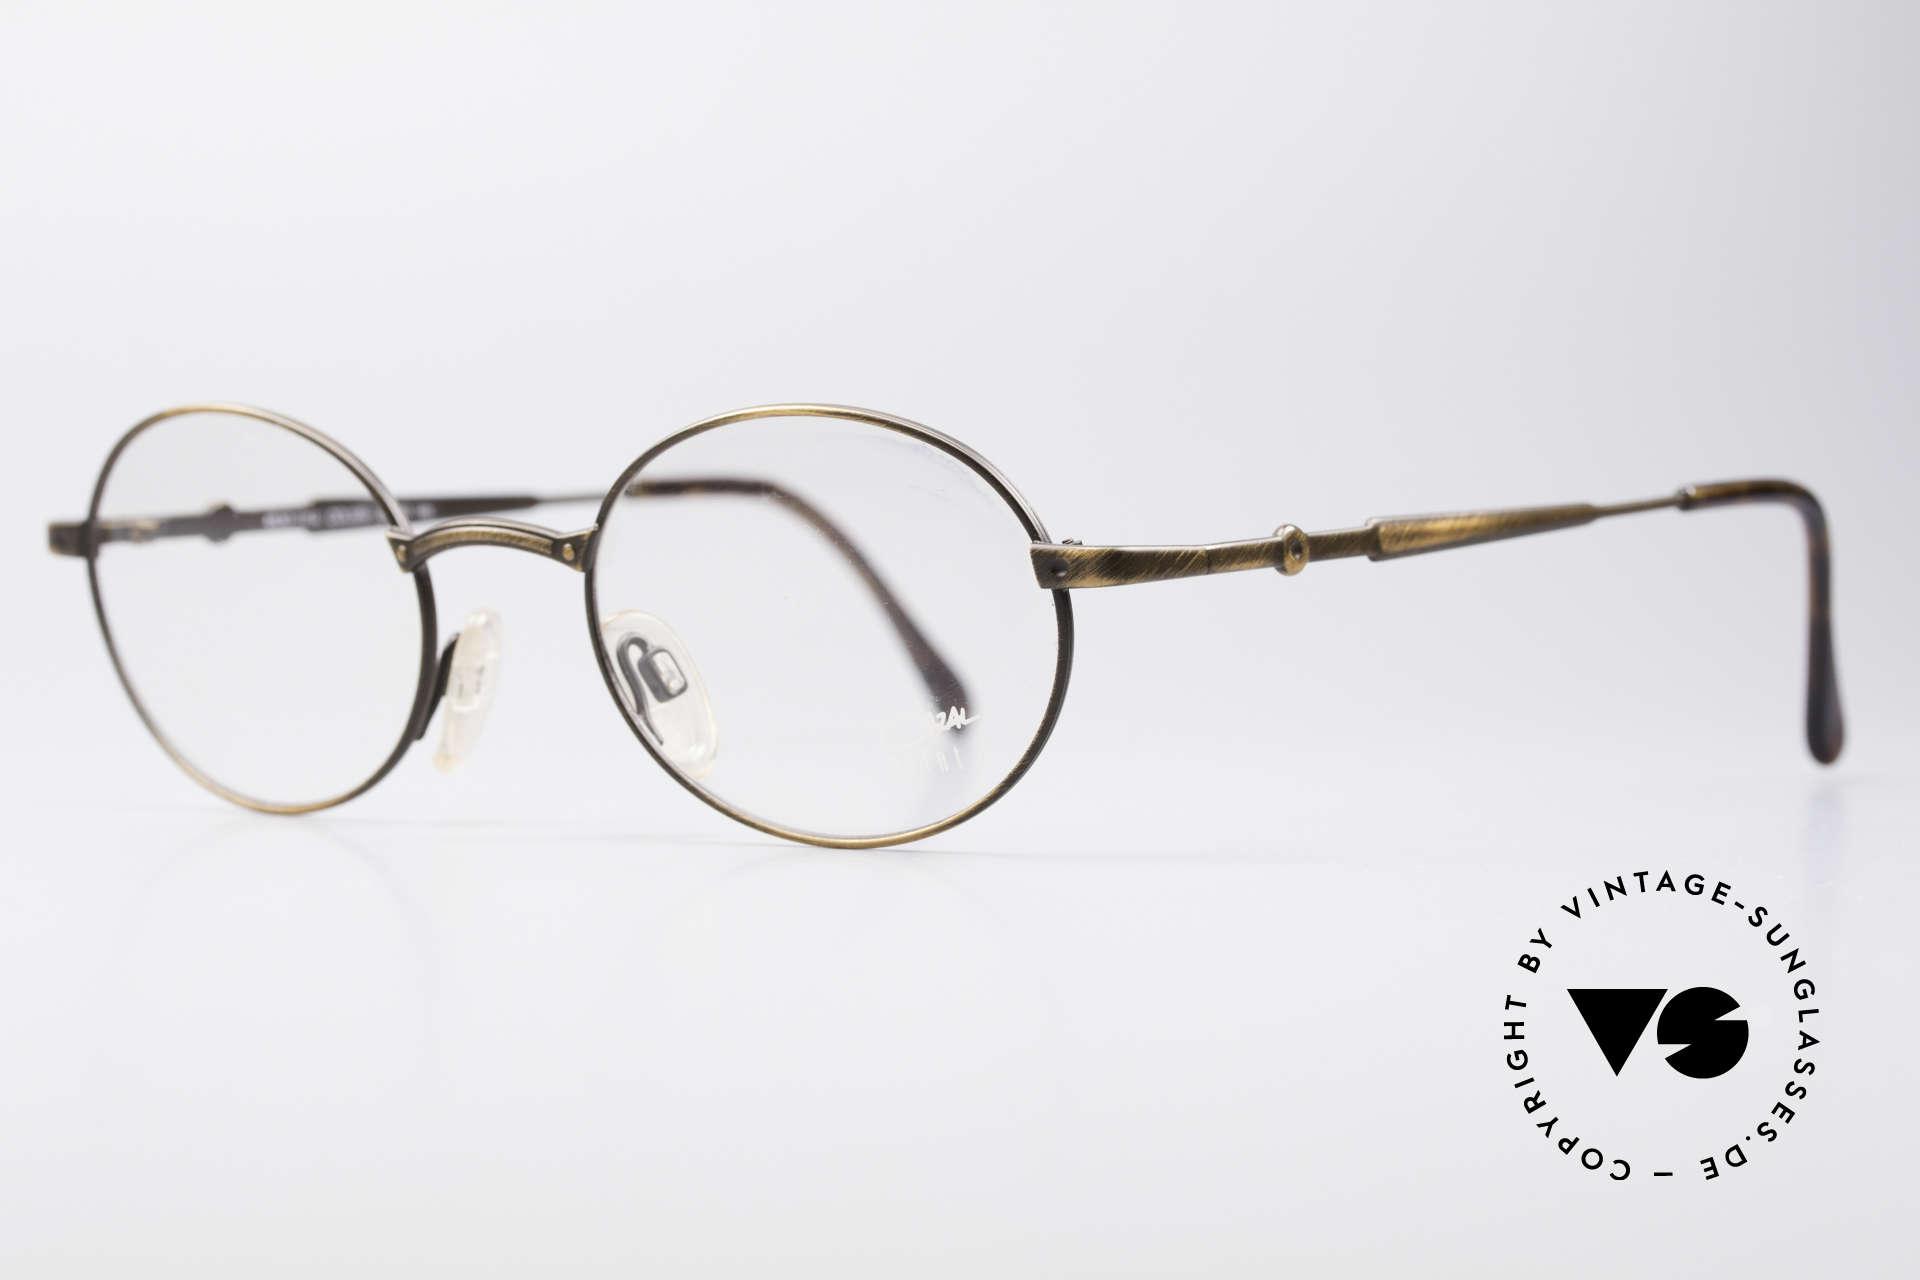 Cazal 1114 - Point 2 Oval Vintage Eyeglass Frame, never used (like all our vintage Cazal designer eyewear), Made for Men and Women